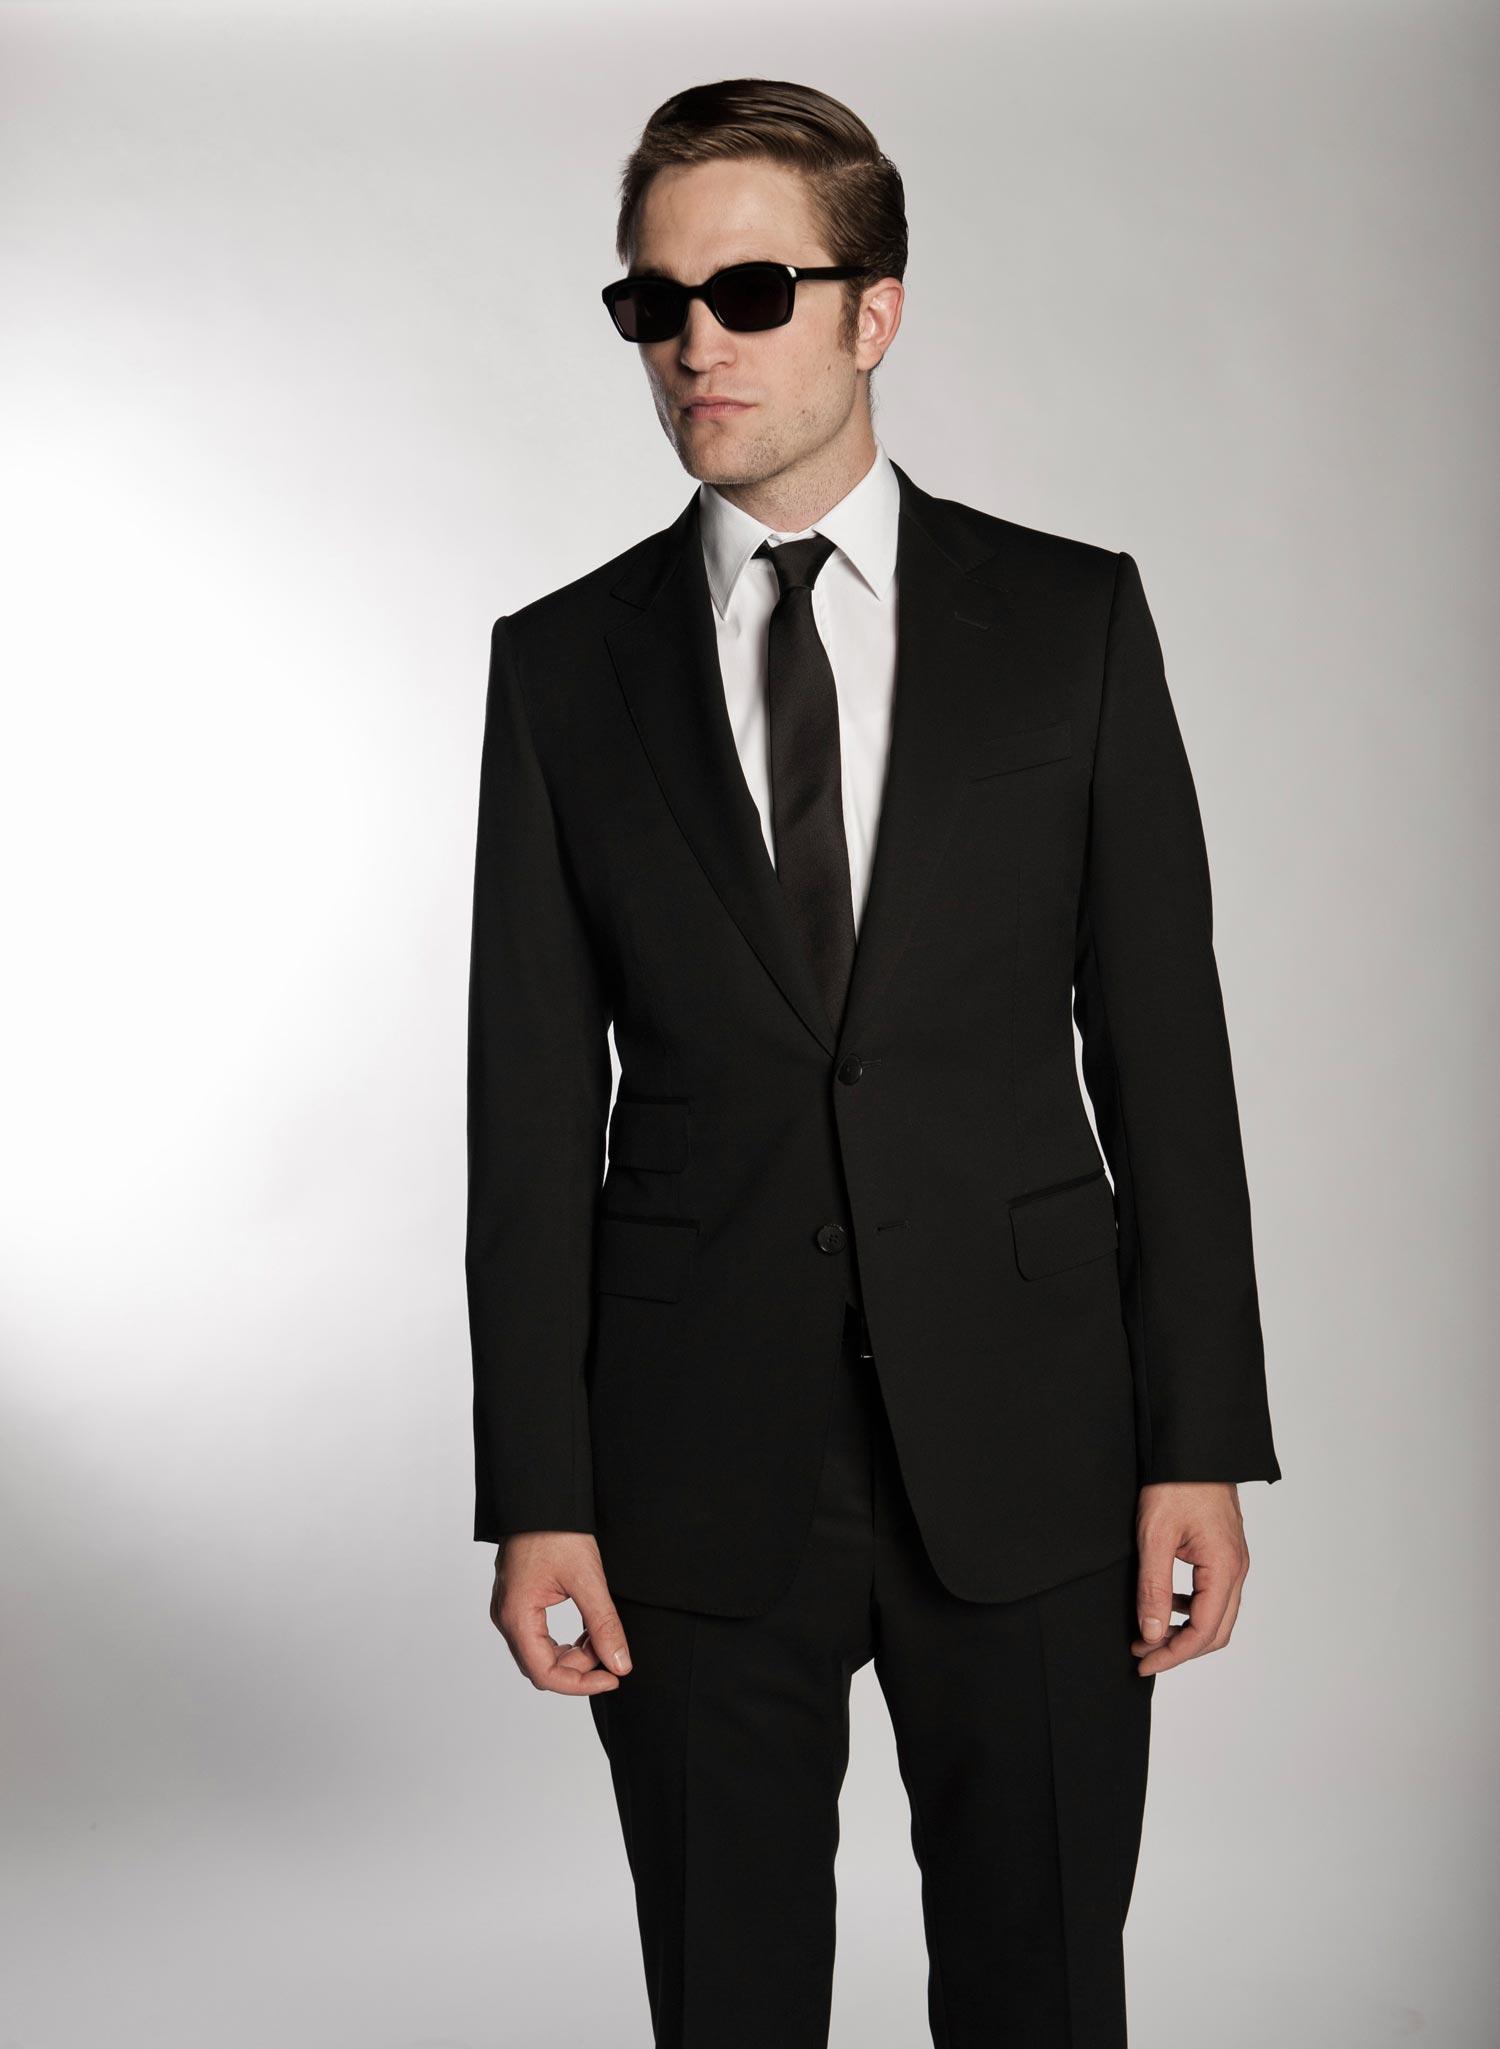 COS_D035-07991-Pattinson-CS